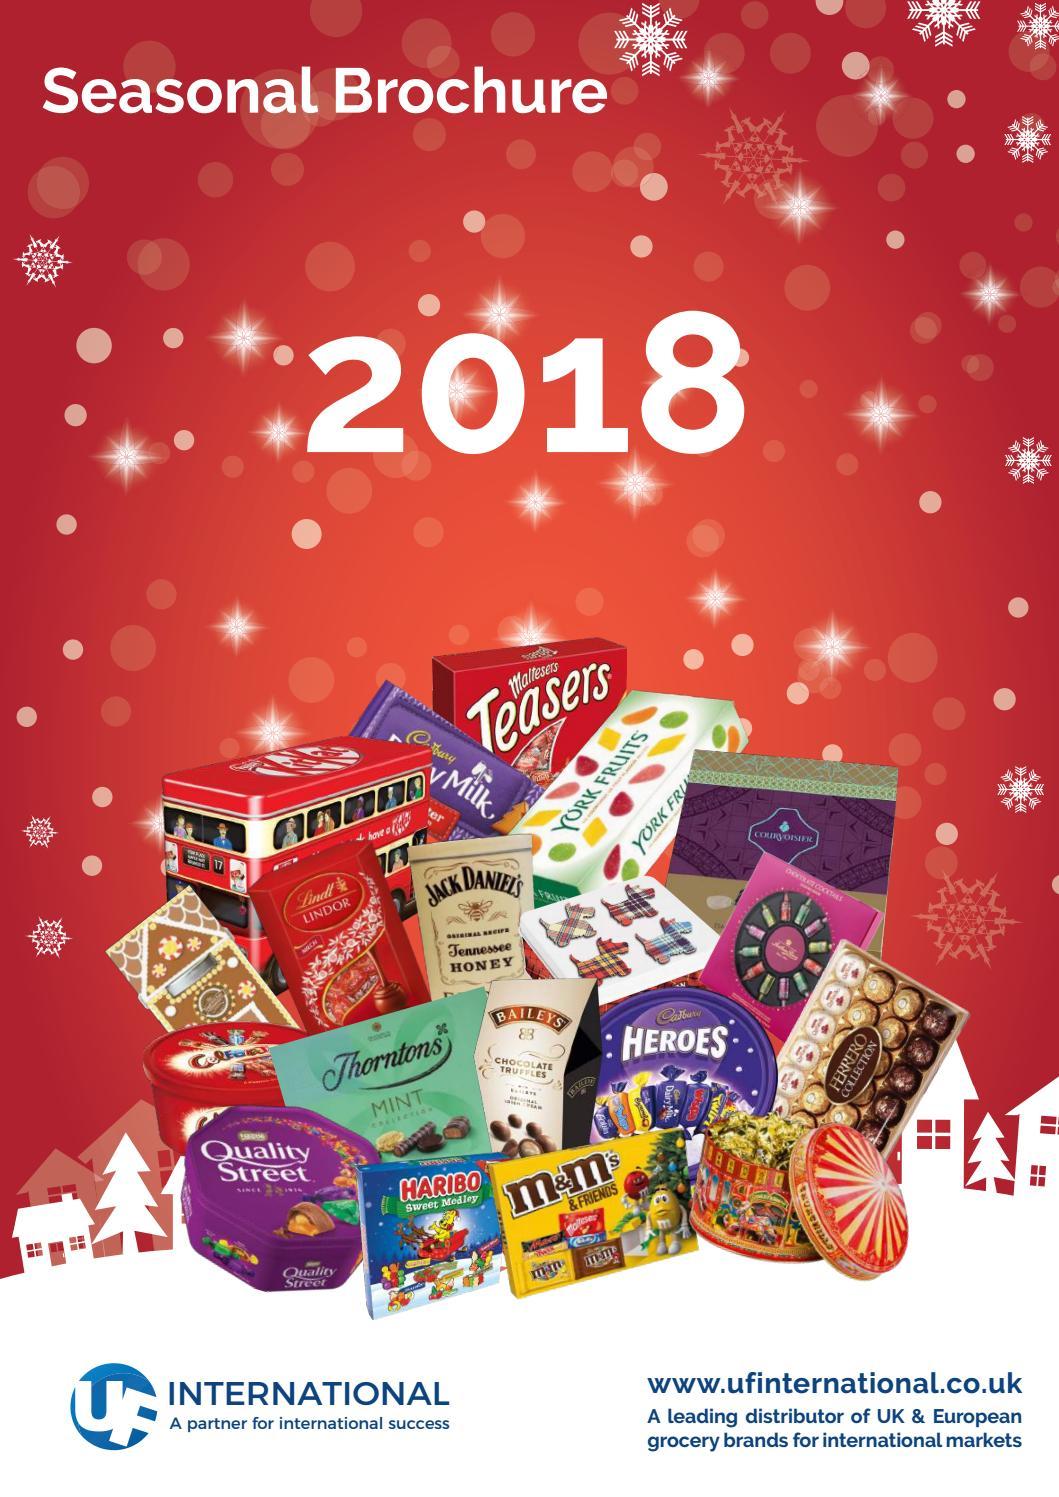 Uf International Seasonal Brochure 2018 By Uf International